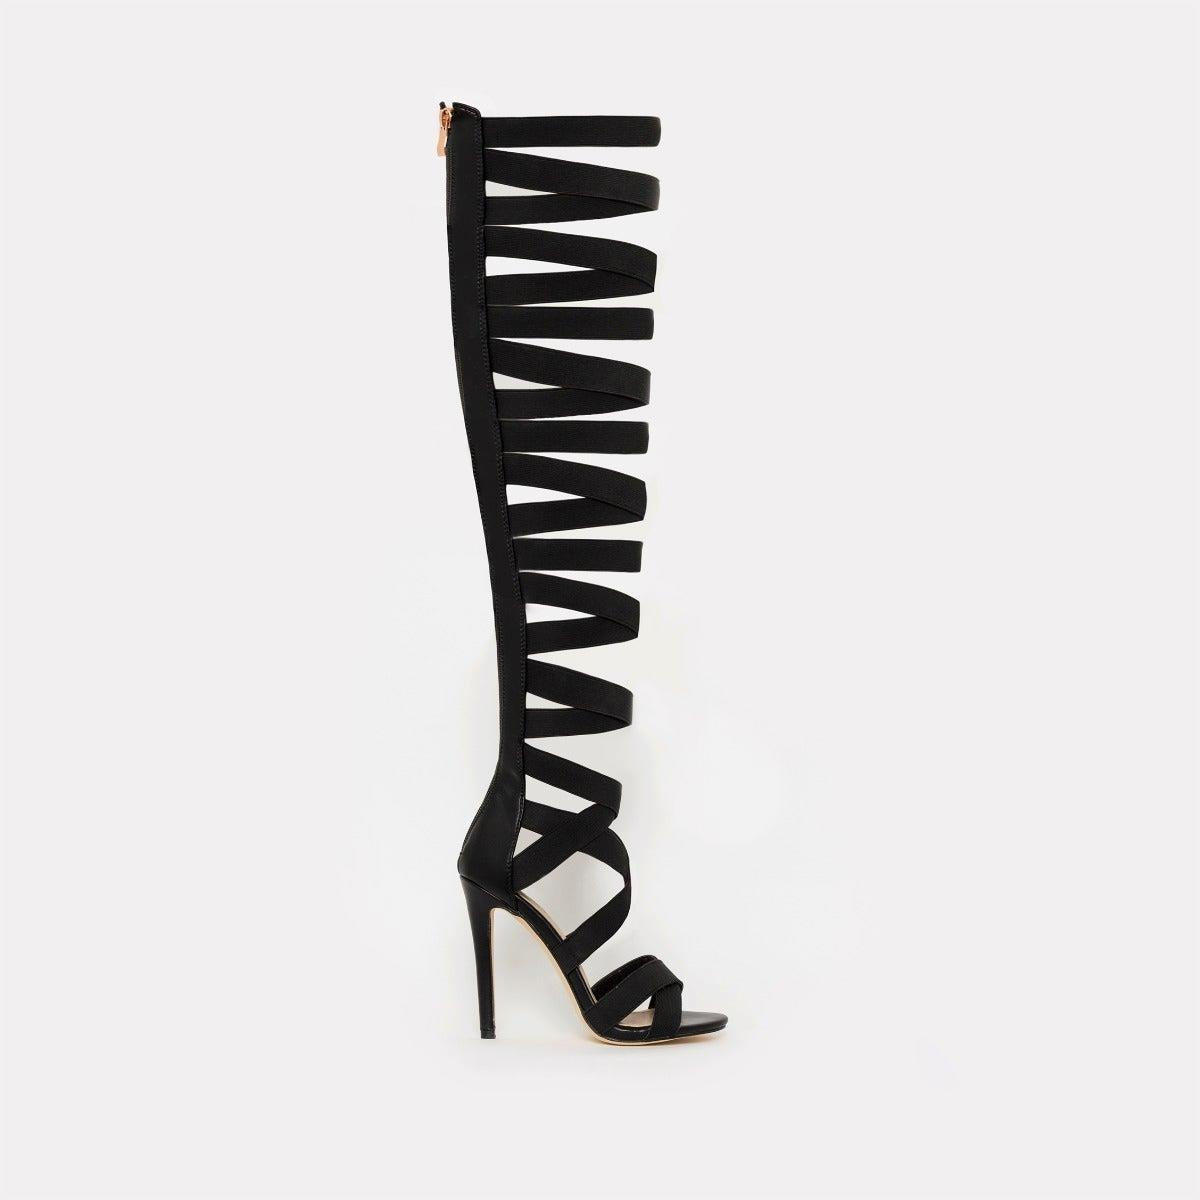 Electra Black Strappy Thigh High Stiletto Heels